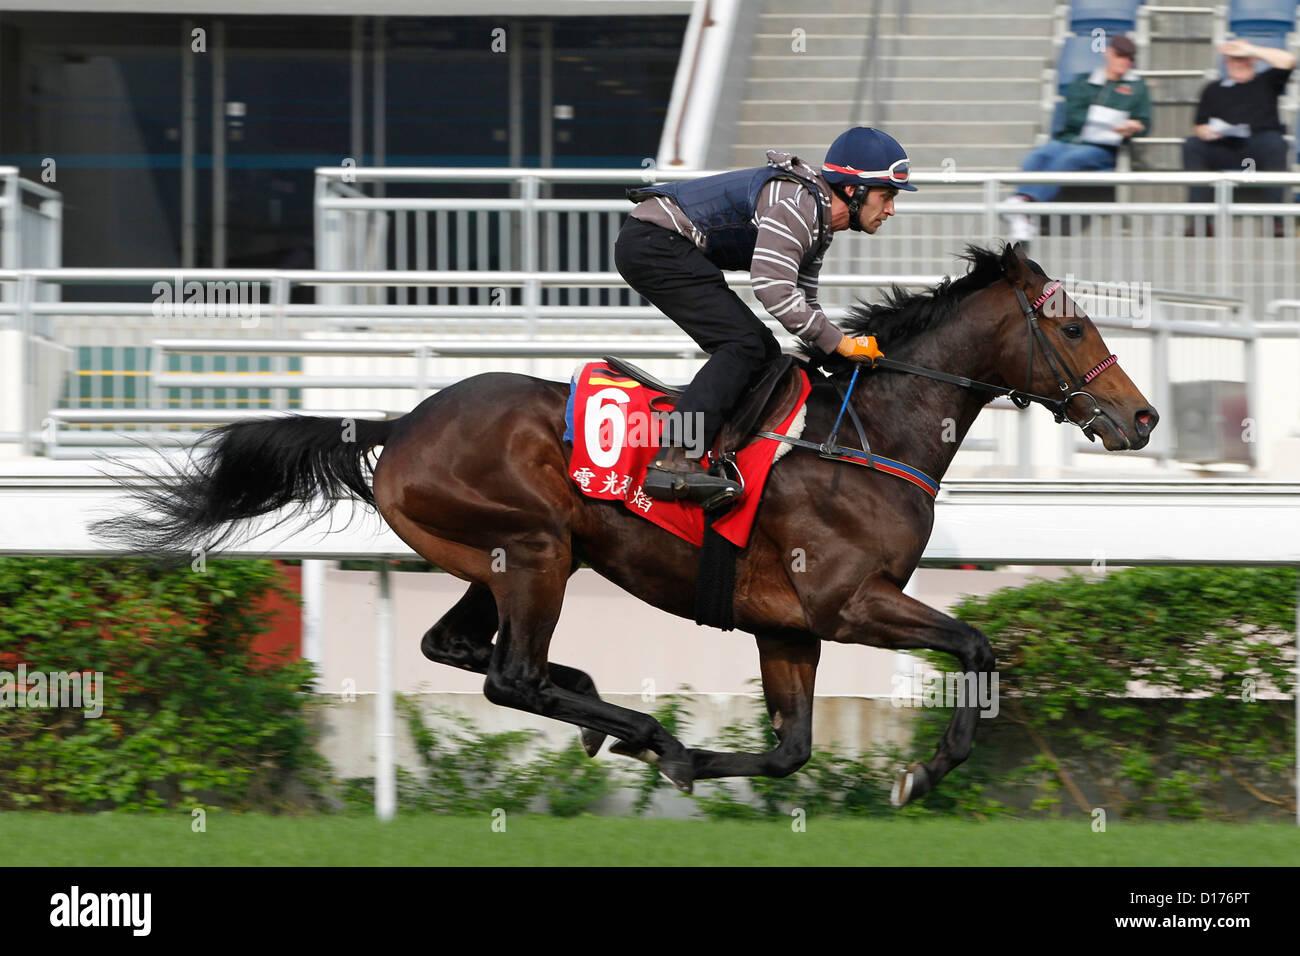 07.12.2012 - Hongkong; Feuerblitz, ridden by Sandor Hegedues during the morning track work. Credit: Lajos-Eric Balogh/turfstock.com - Stock Image